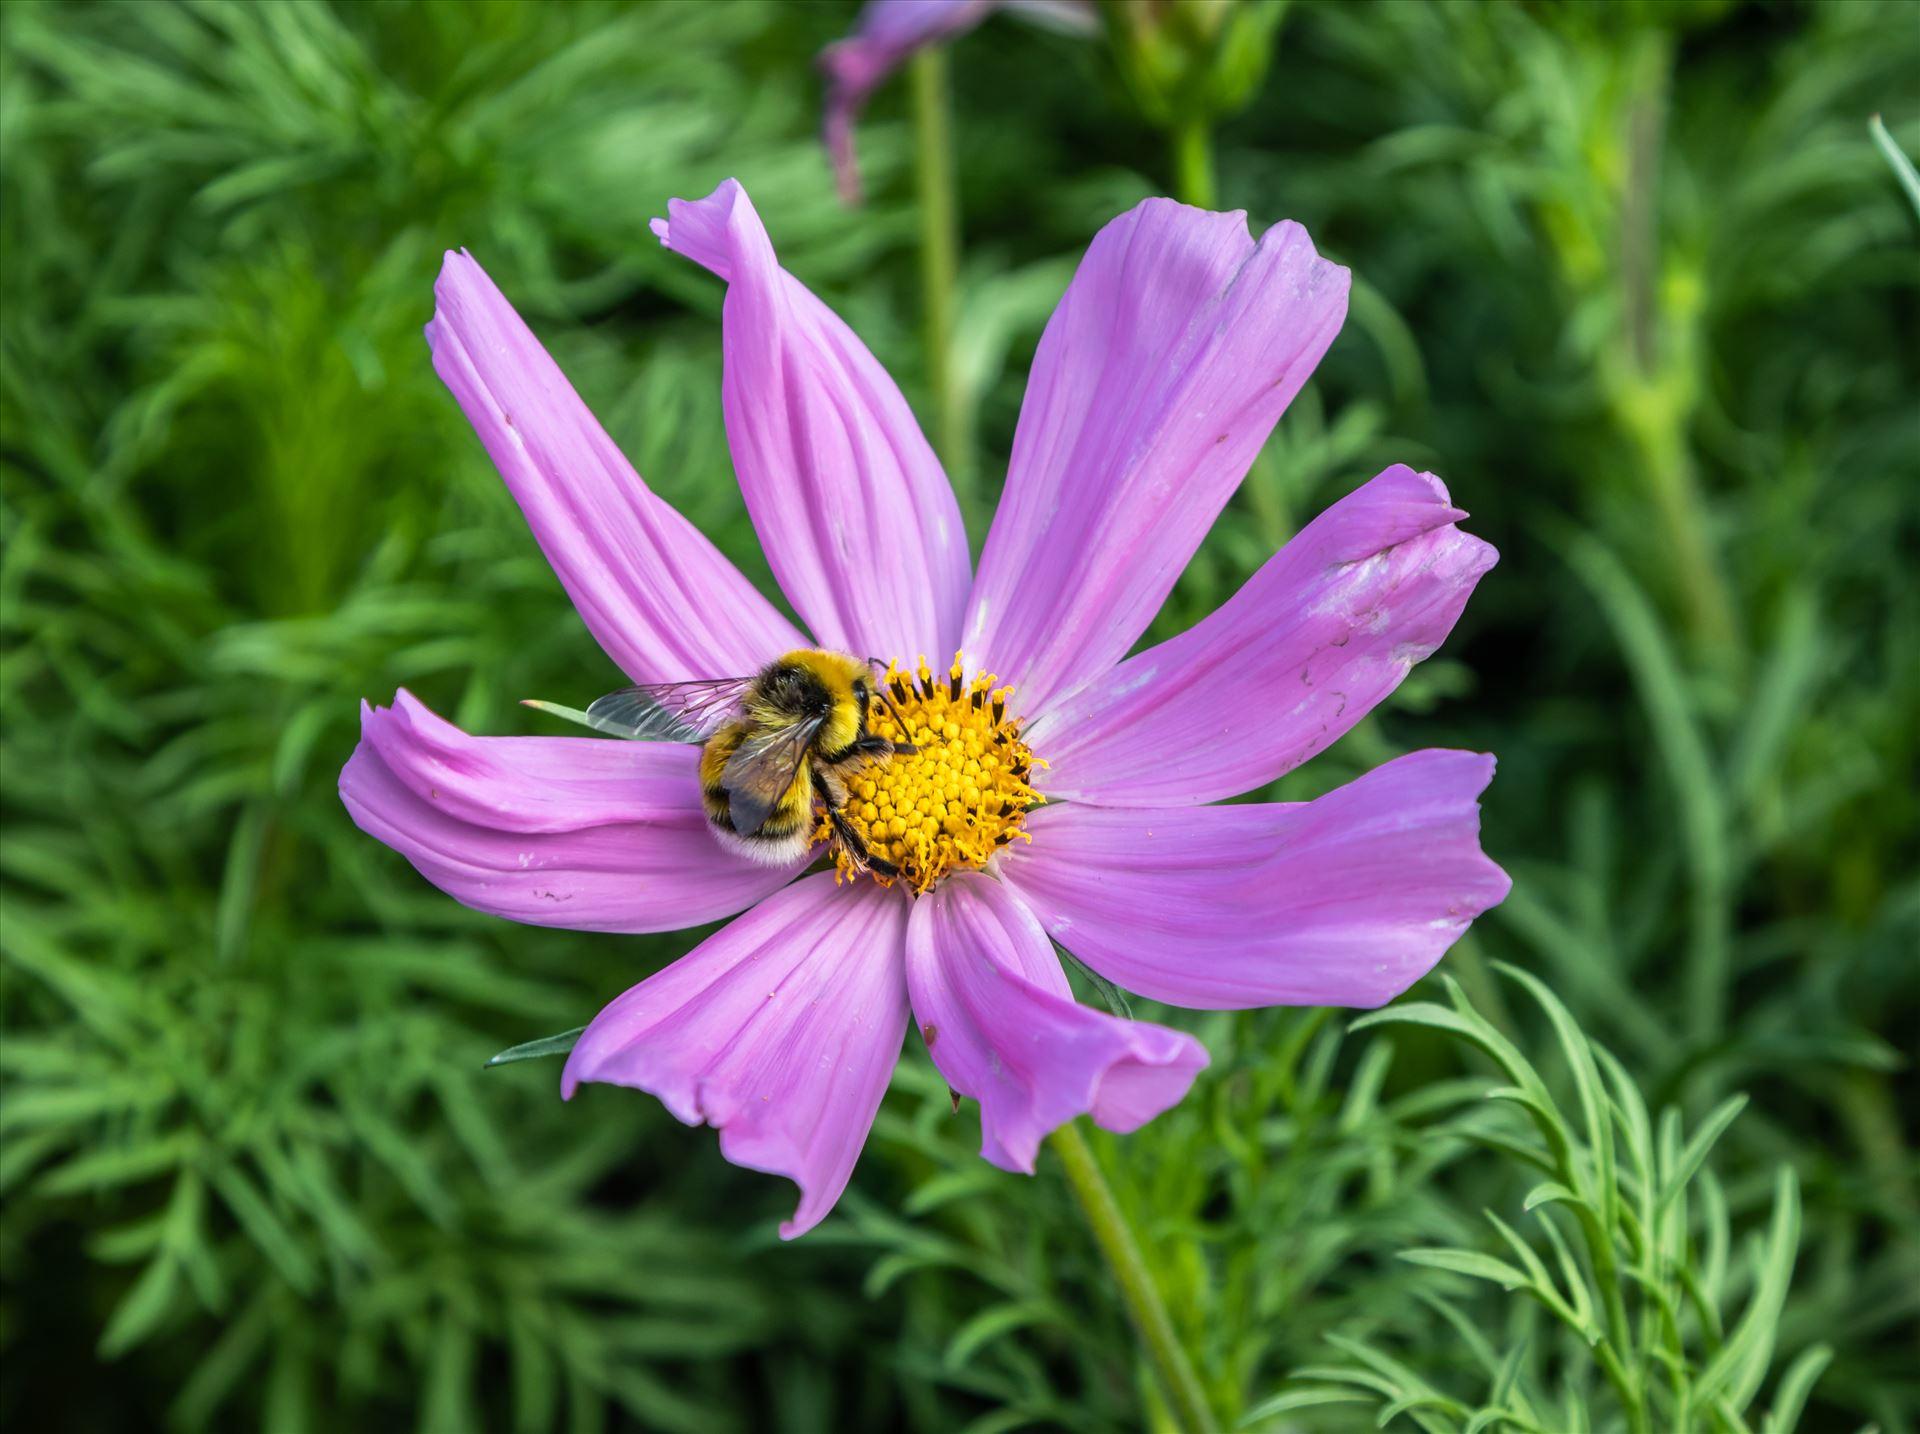 Purple Mexican Aster Pink Garden Cosmos - Cosmos Bipinnatus by Andy Morton Photography